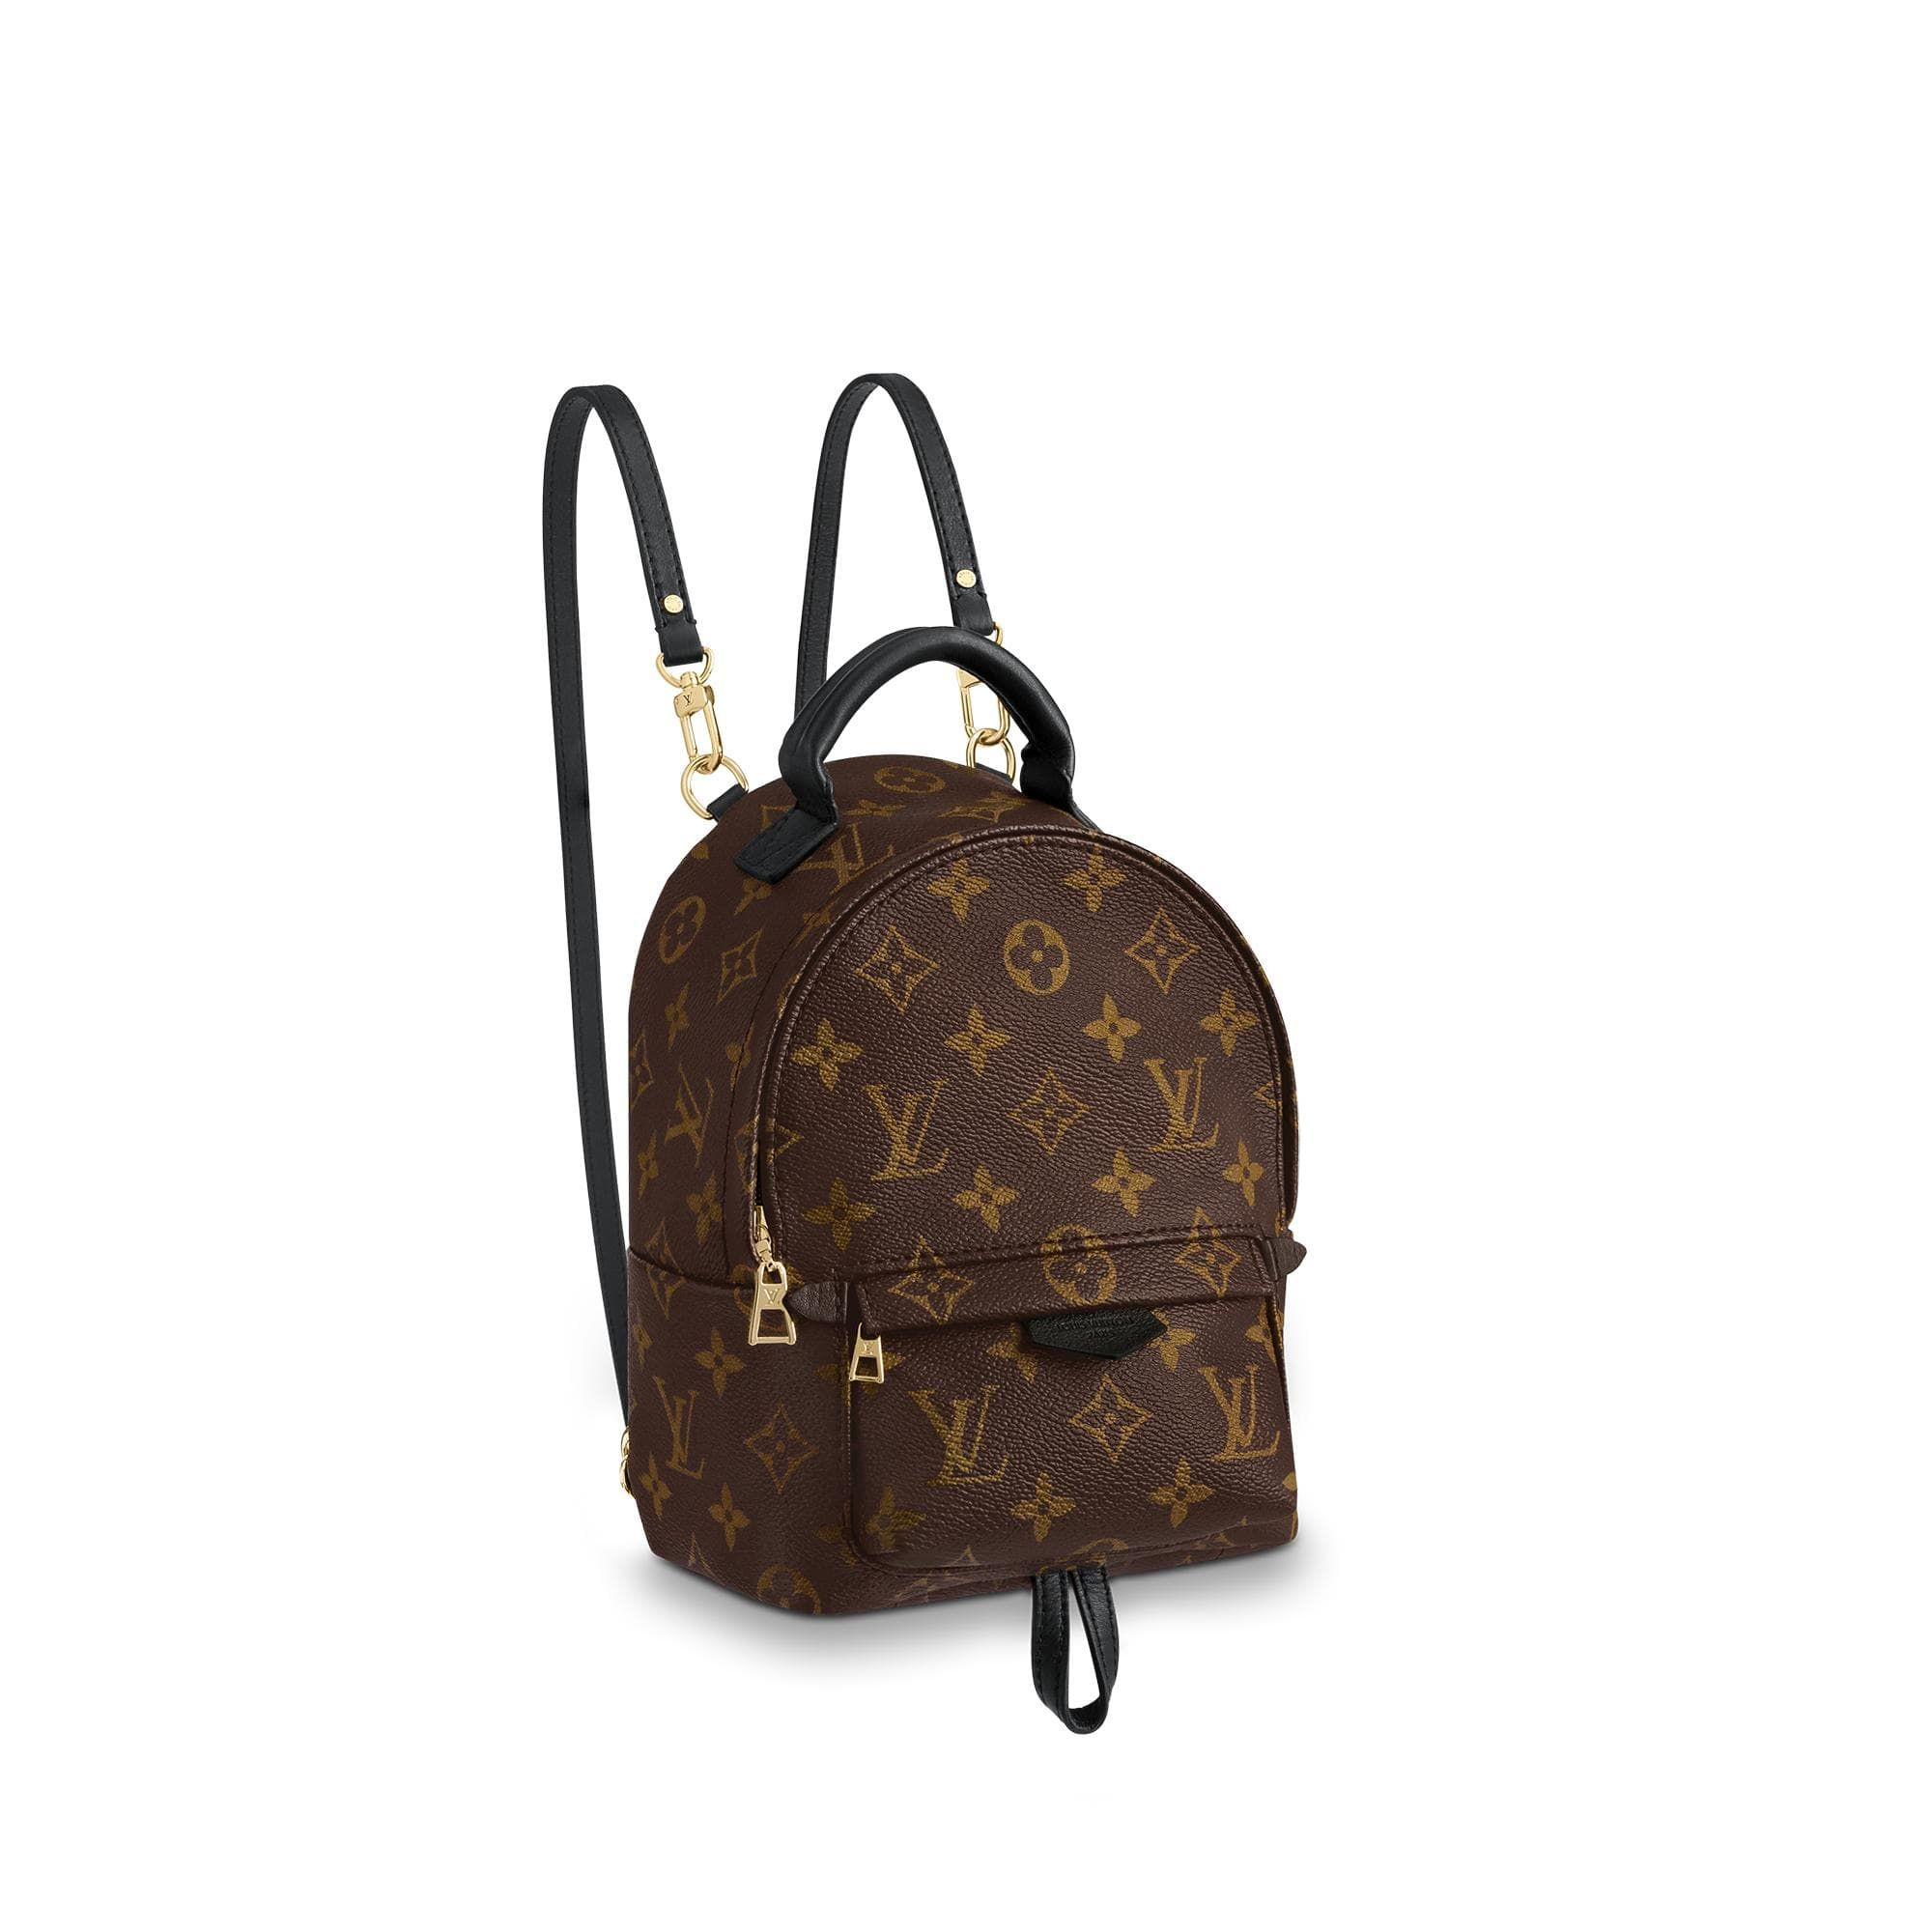 9230b20f46f6 Palm Springs Backpack Mini via Louis Vuitton